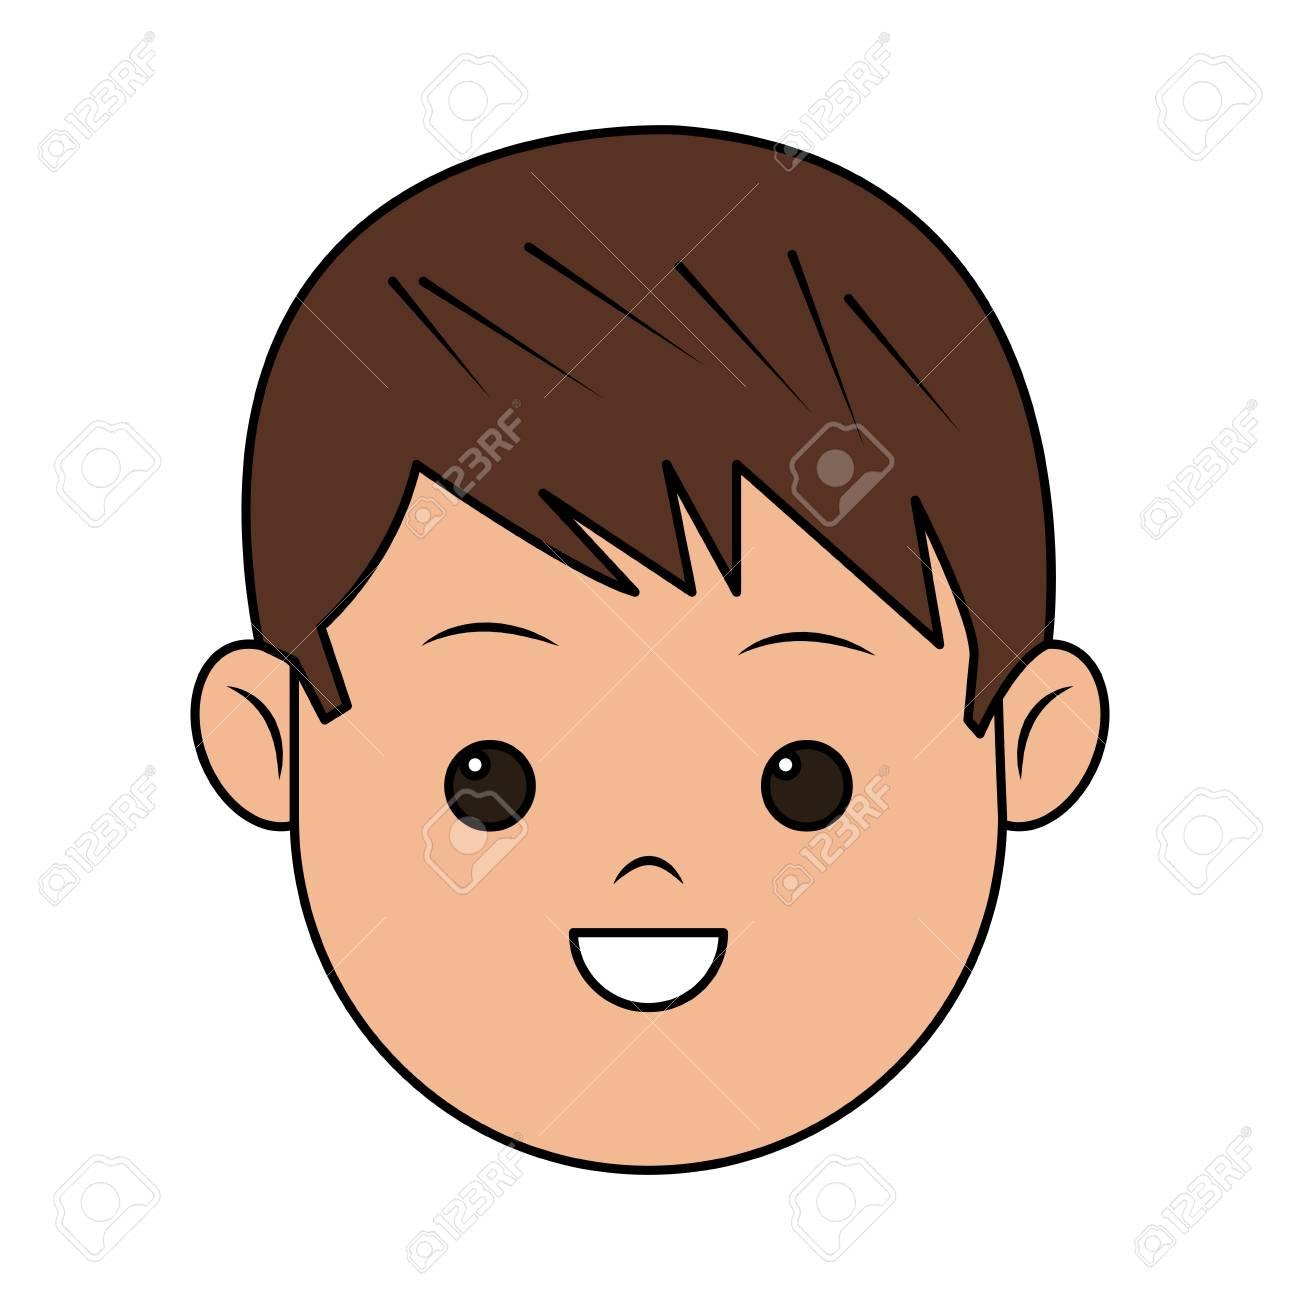 Niño Feliz Icono De Dibujos Animados De Cara Sobre Fondo Blanco